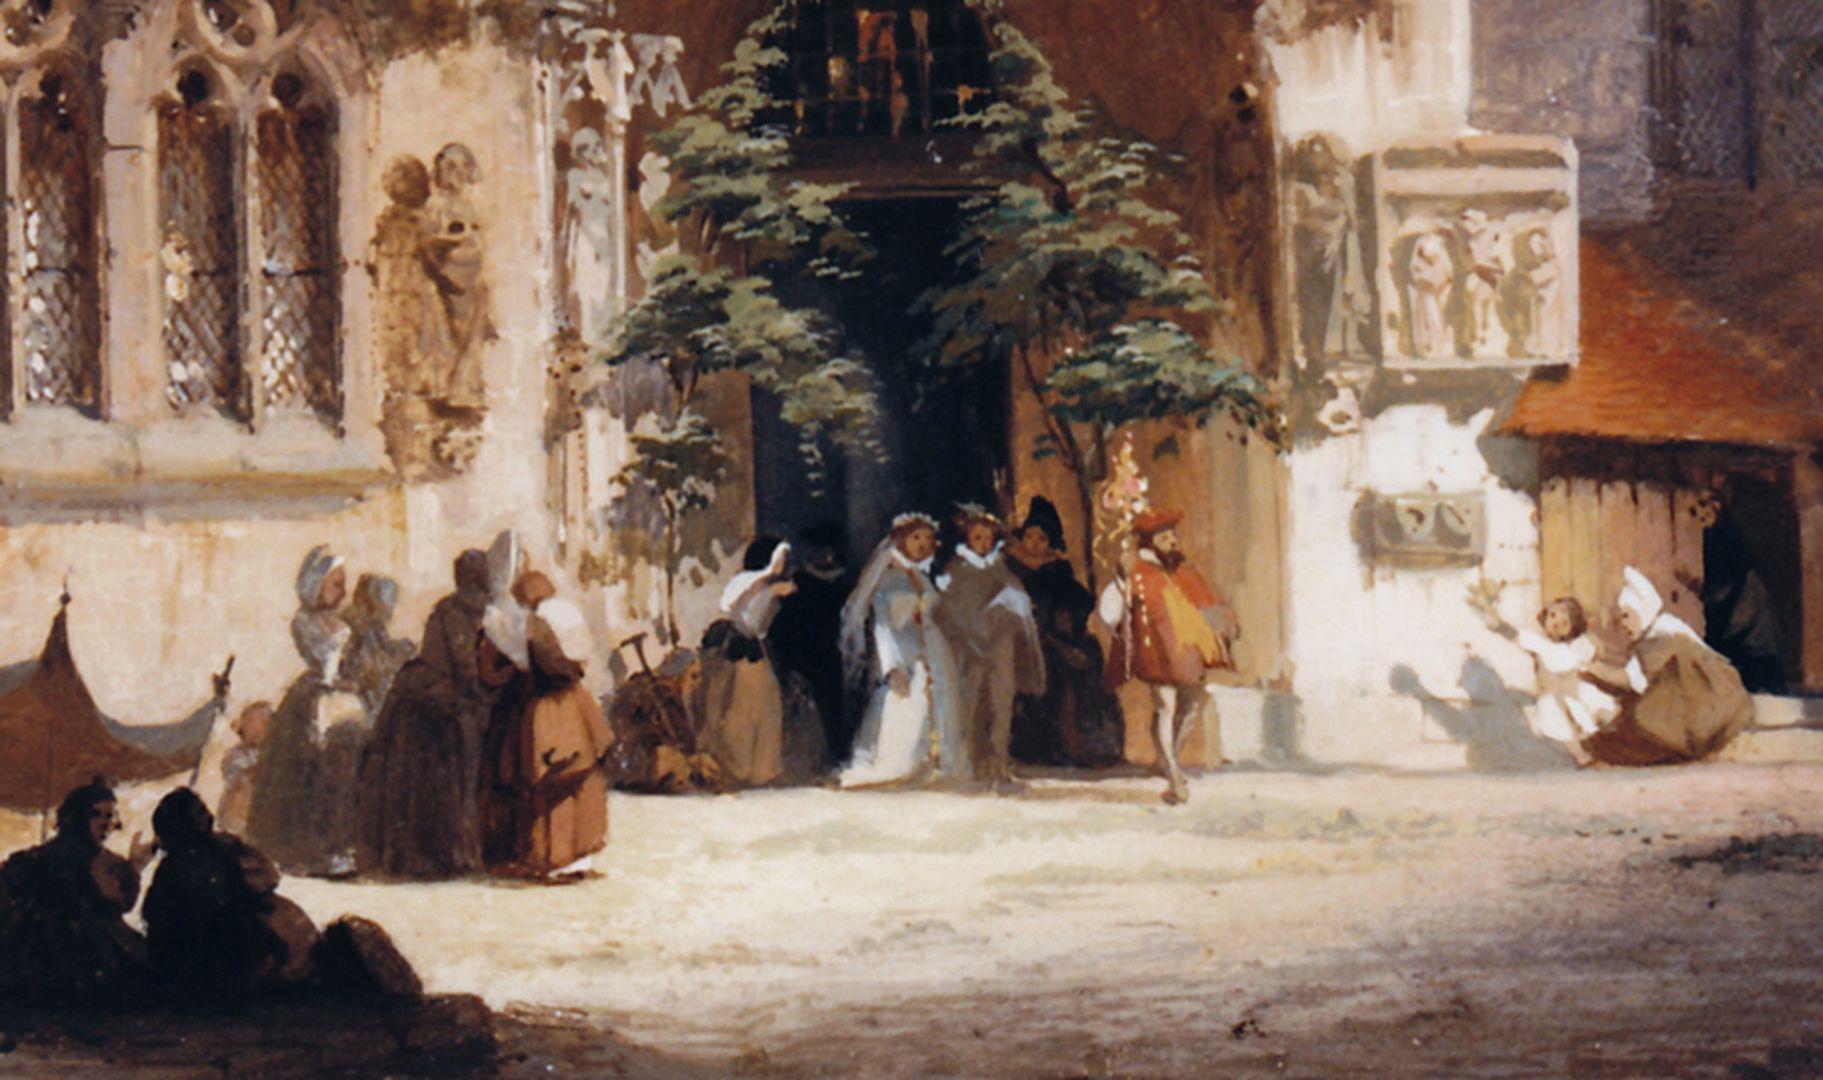 Brautportal an der Sebalduskirche Detail mit Hochzeitsgesellschaft